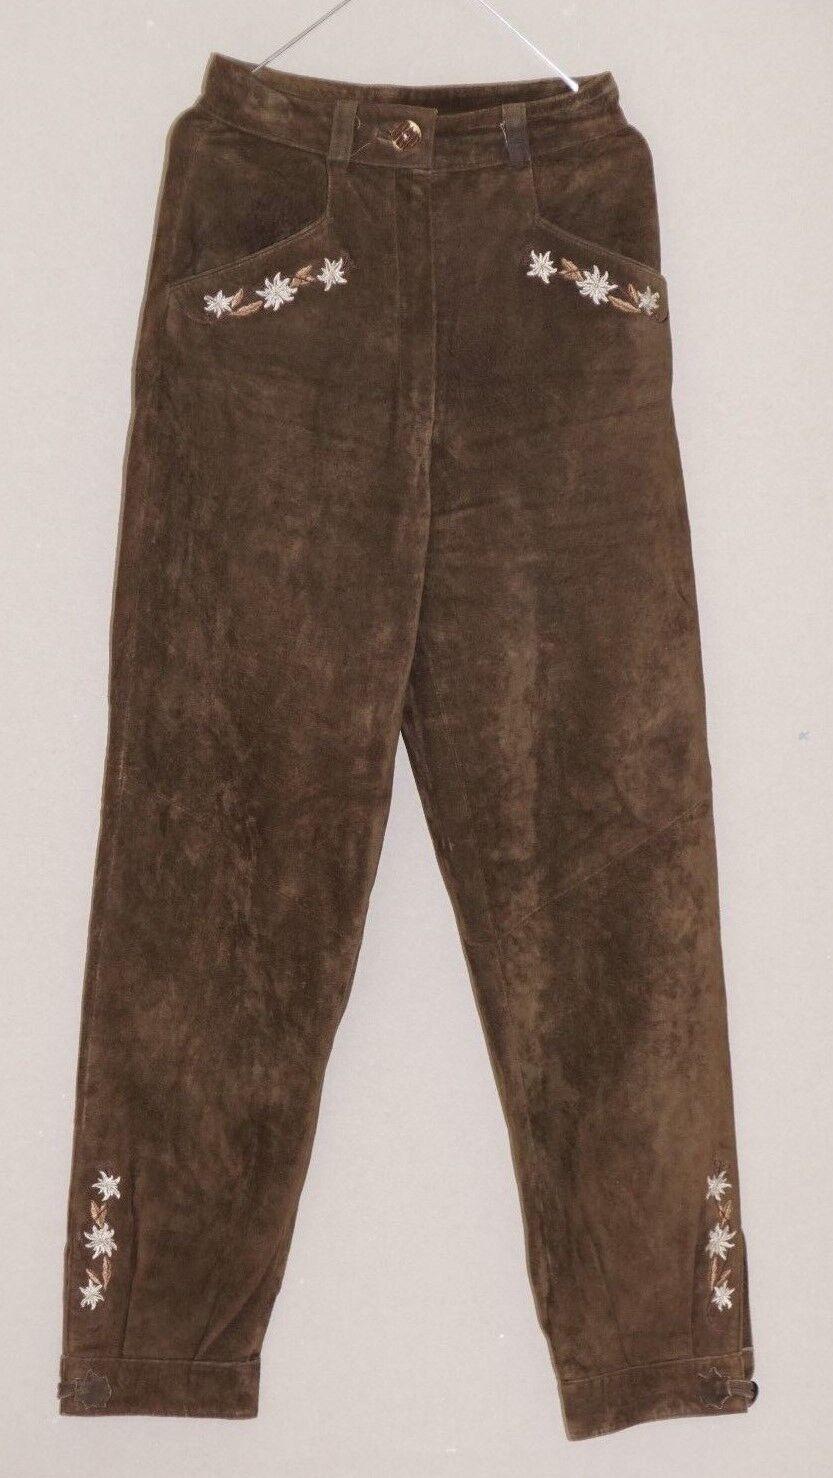 Trachtenhose Tracht Lederhose Damen braun Edelweiß Größe 34 (1702L-OH3 (1702L-OH3 (1702L-OH3 )    New Product 2019    Meistverkaufte weltweit    Angenehmes Aussehen  a341f4